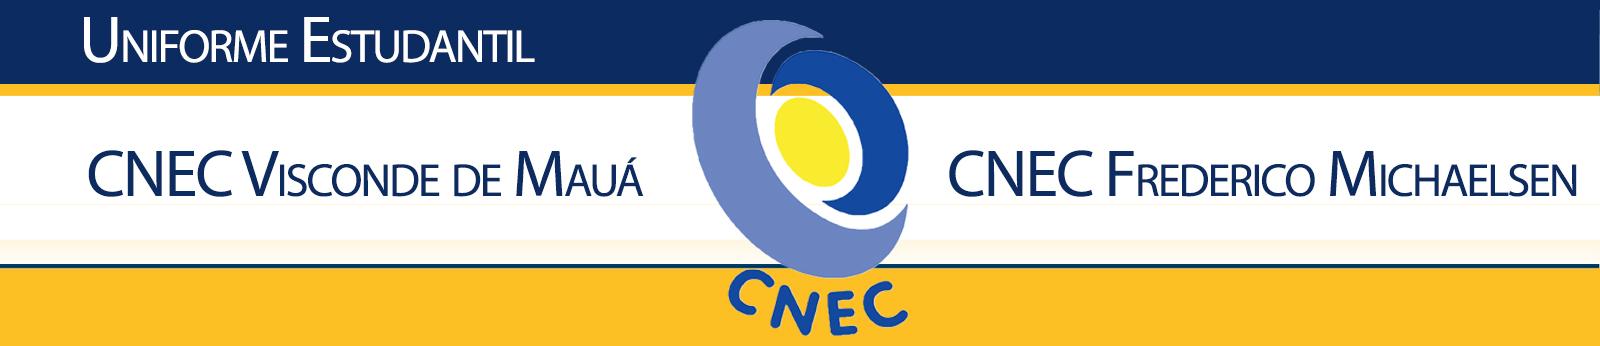 Link para CNEC